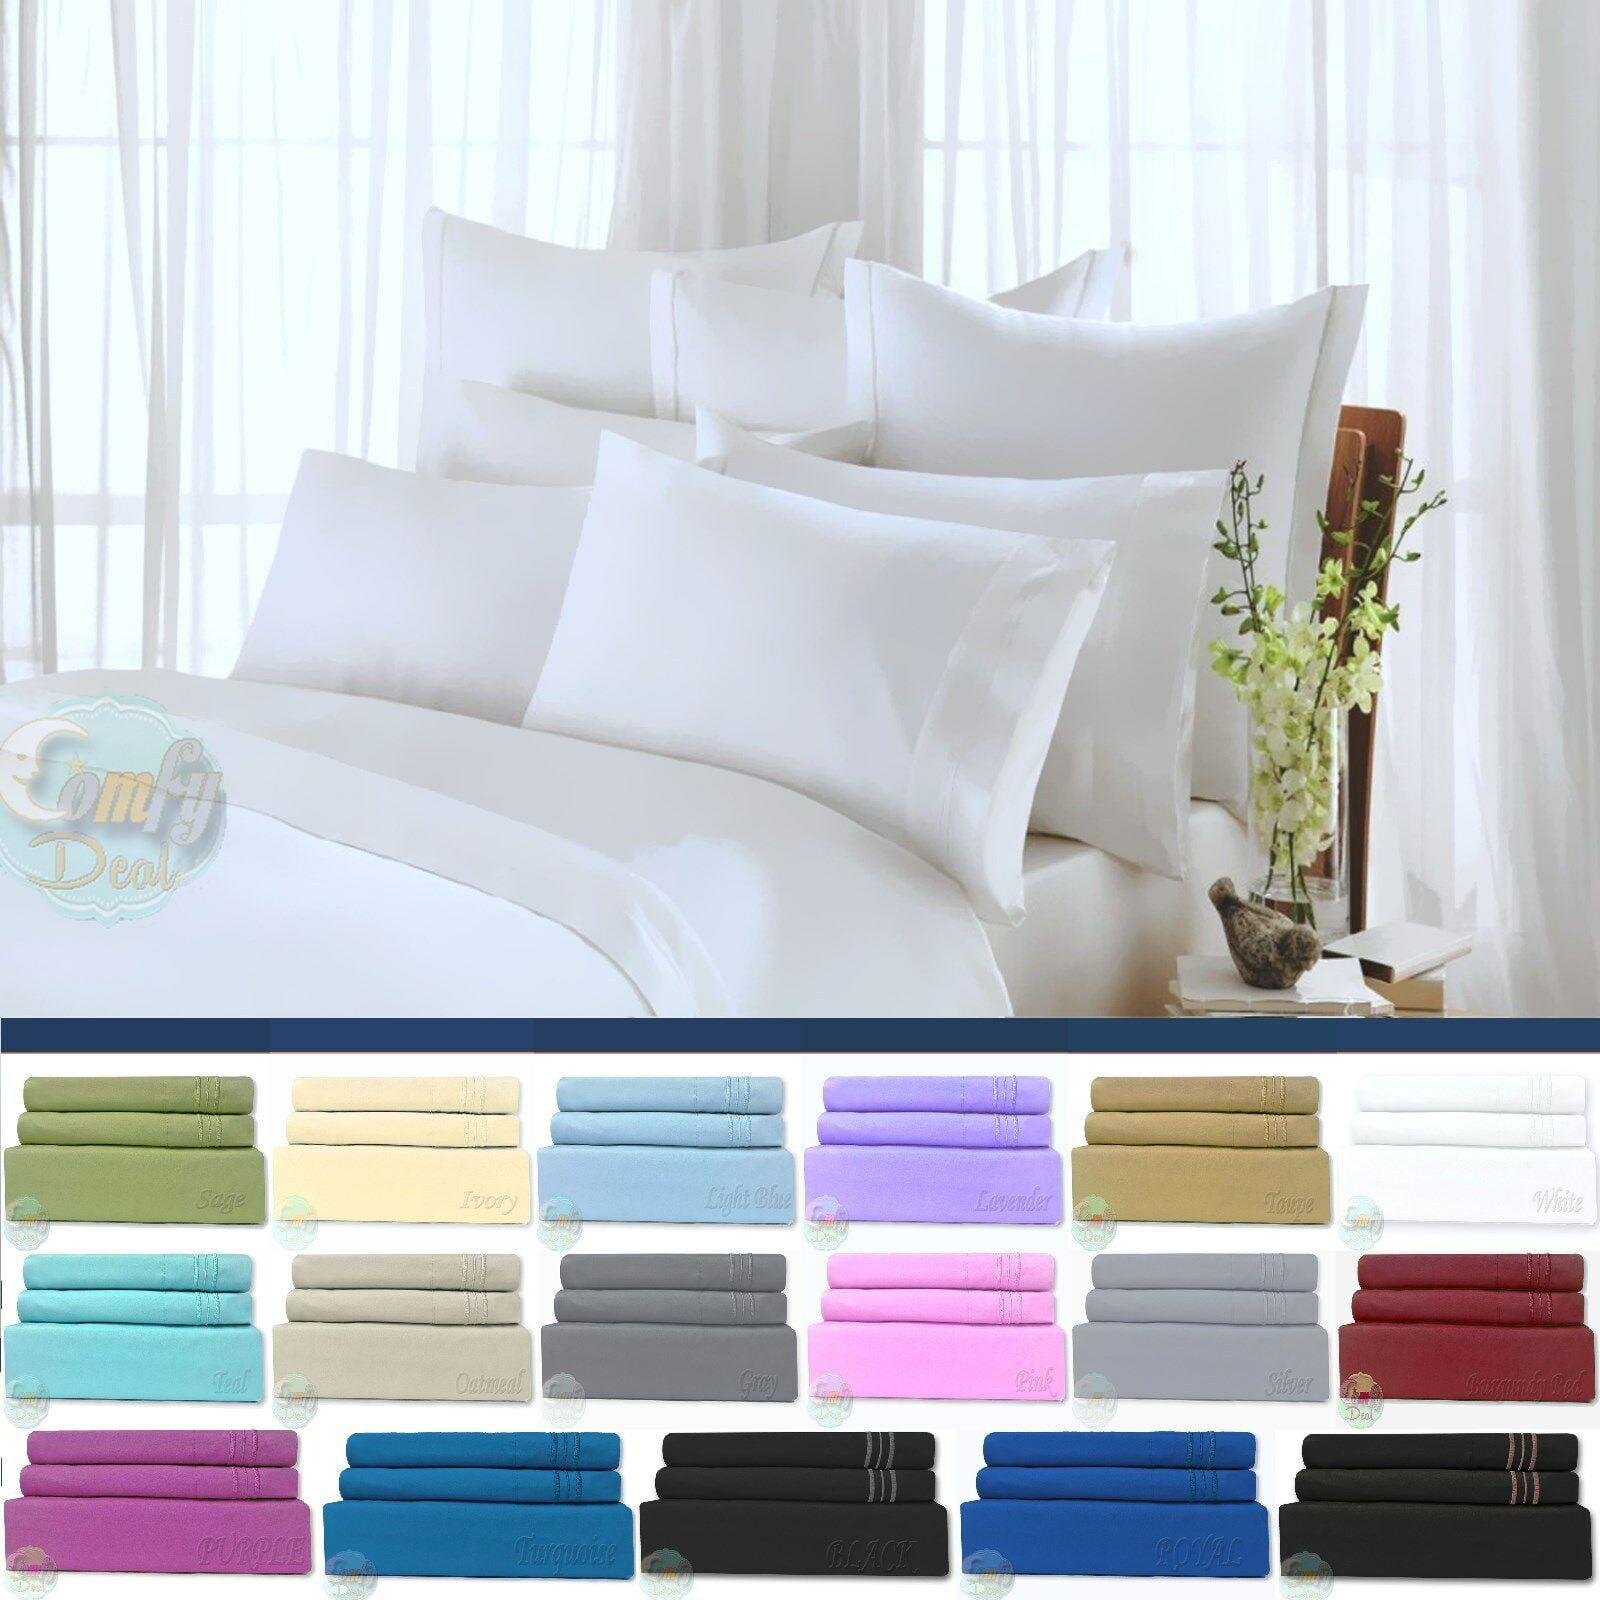 Bed Sheet Set 4 Piece Egyptian Comfort 1800 Count Bedding Deep Pocket Bed Sheet